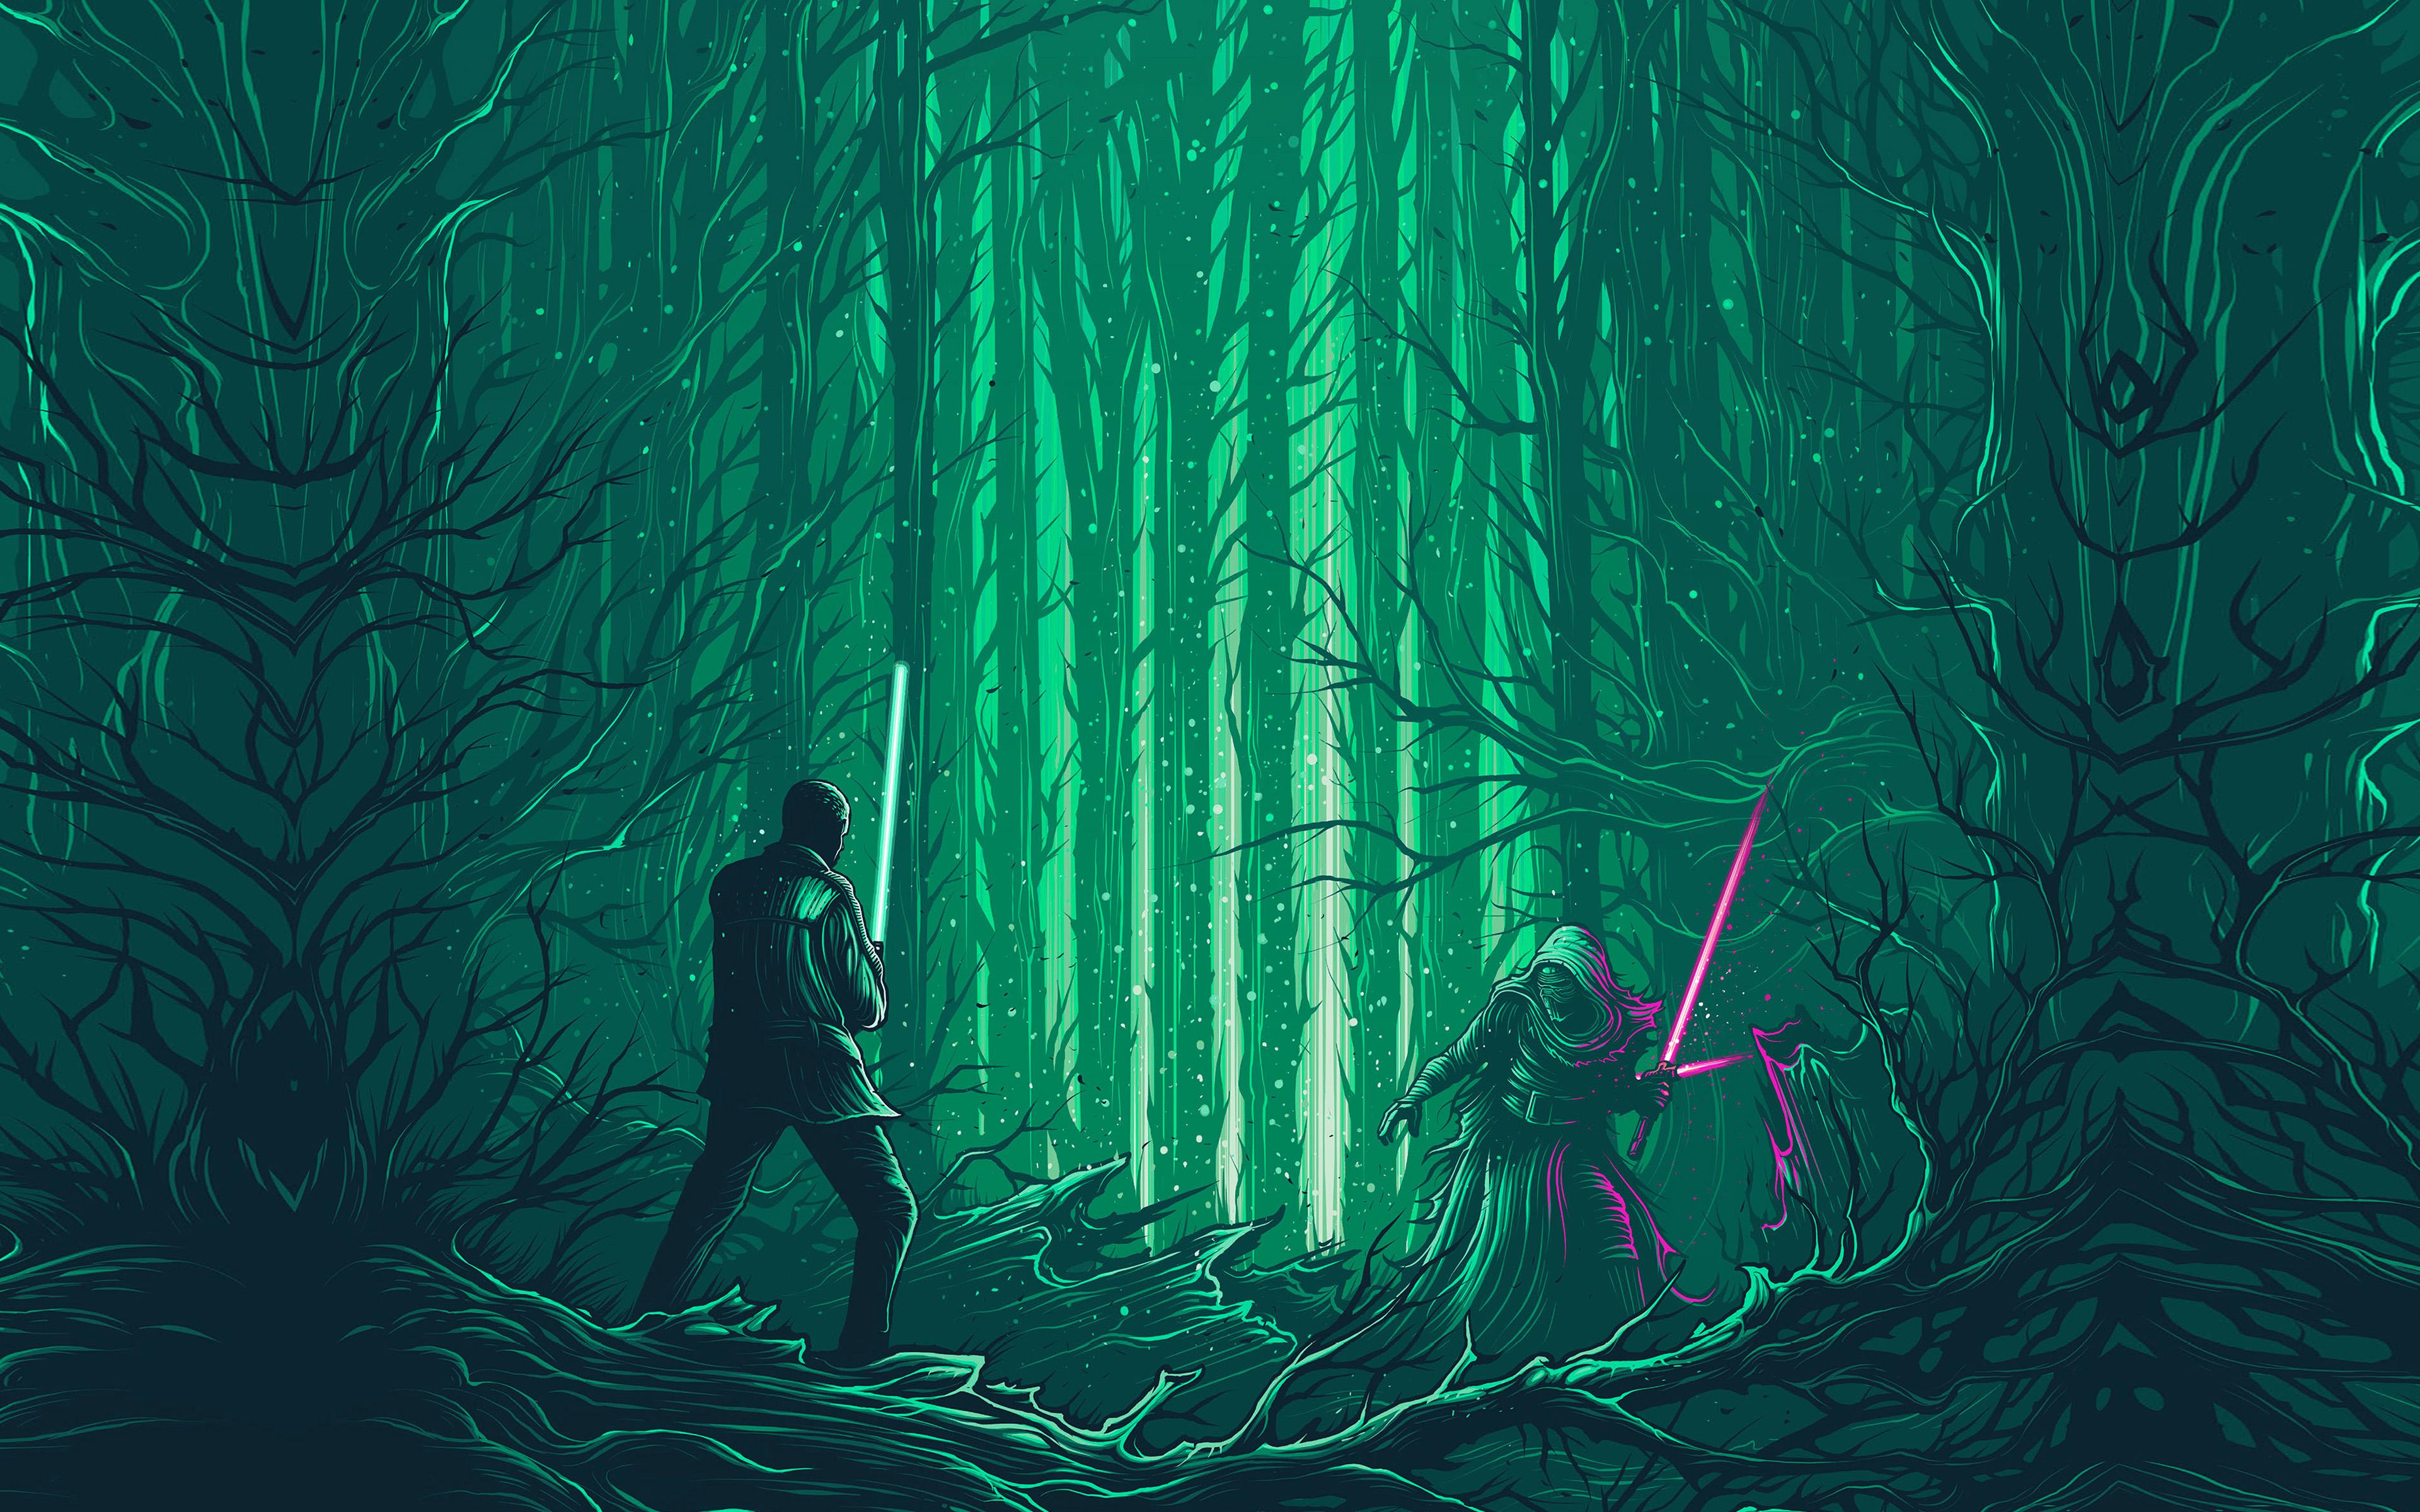 Ap47 Starwars Illustration Green Art Film Wallpaper